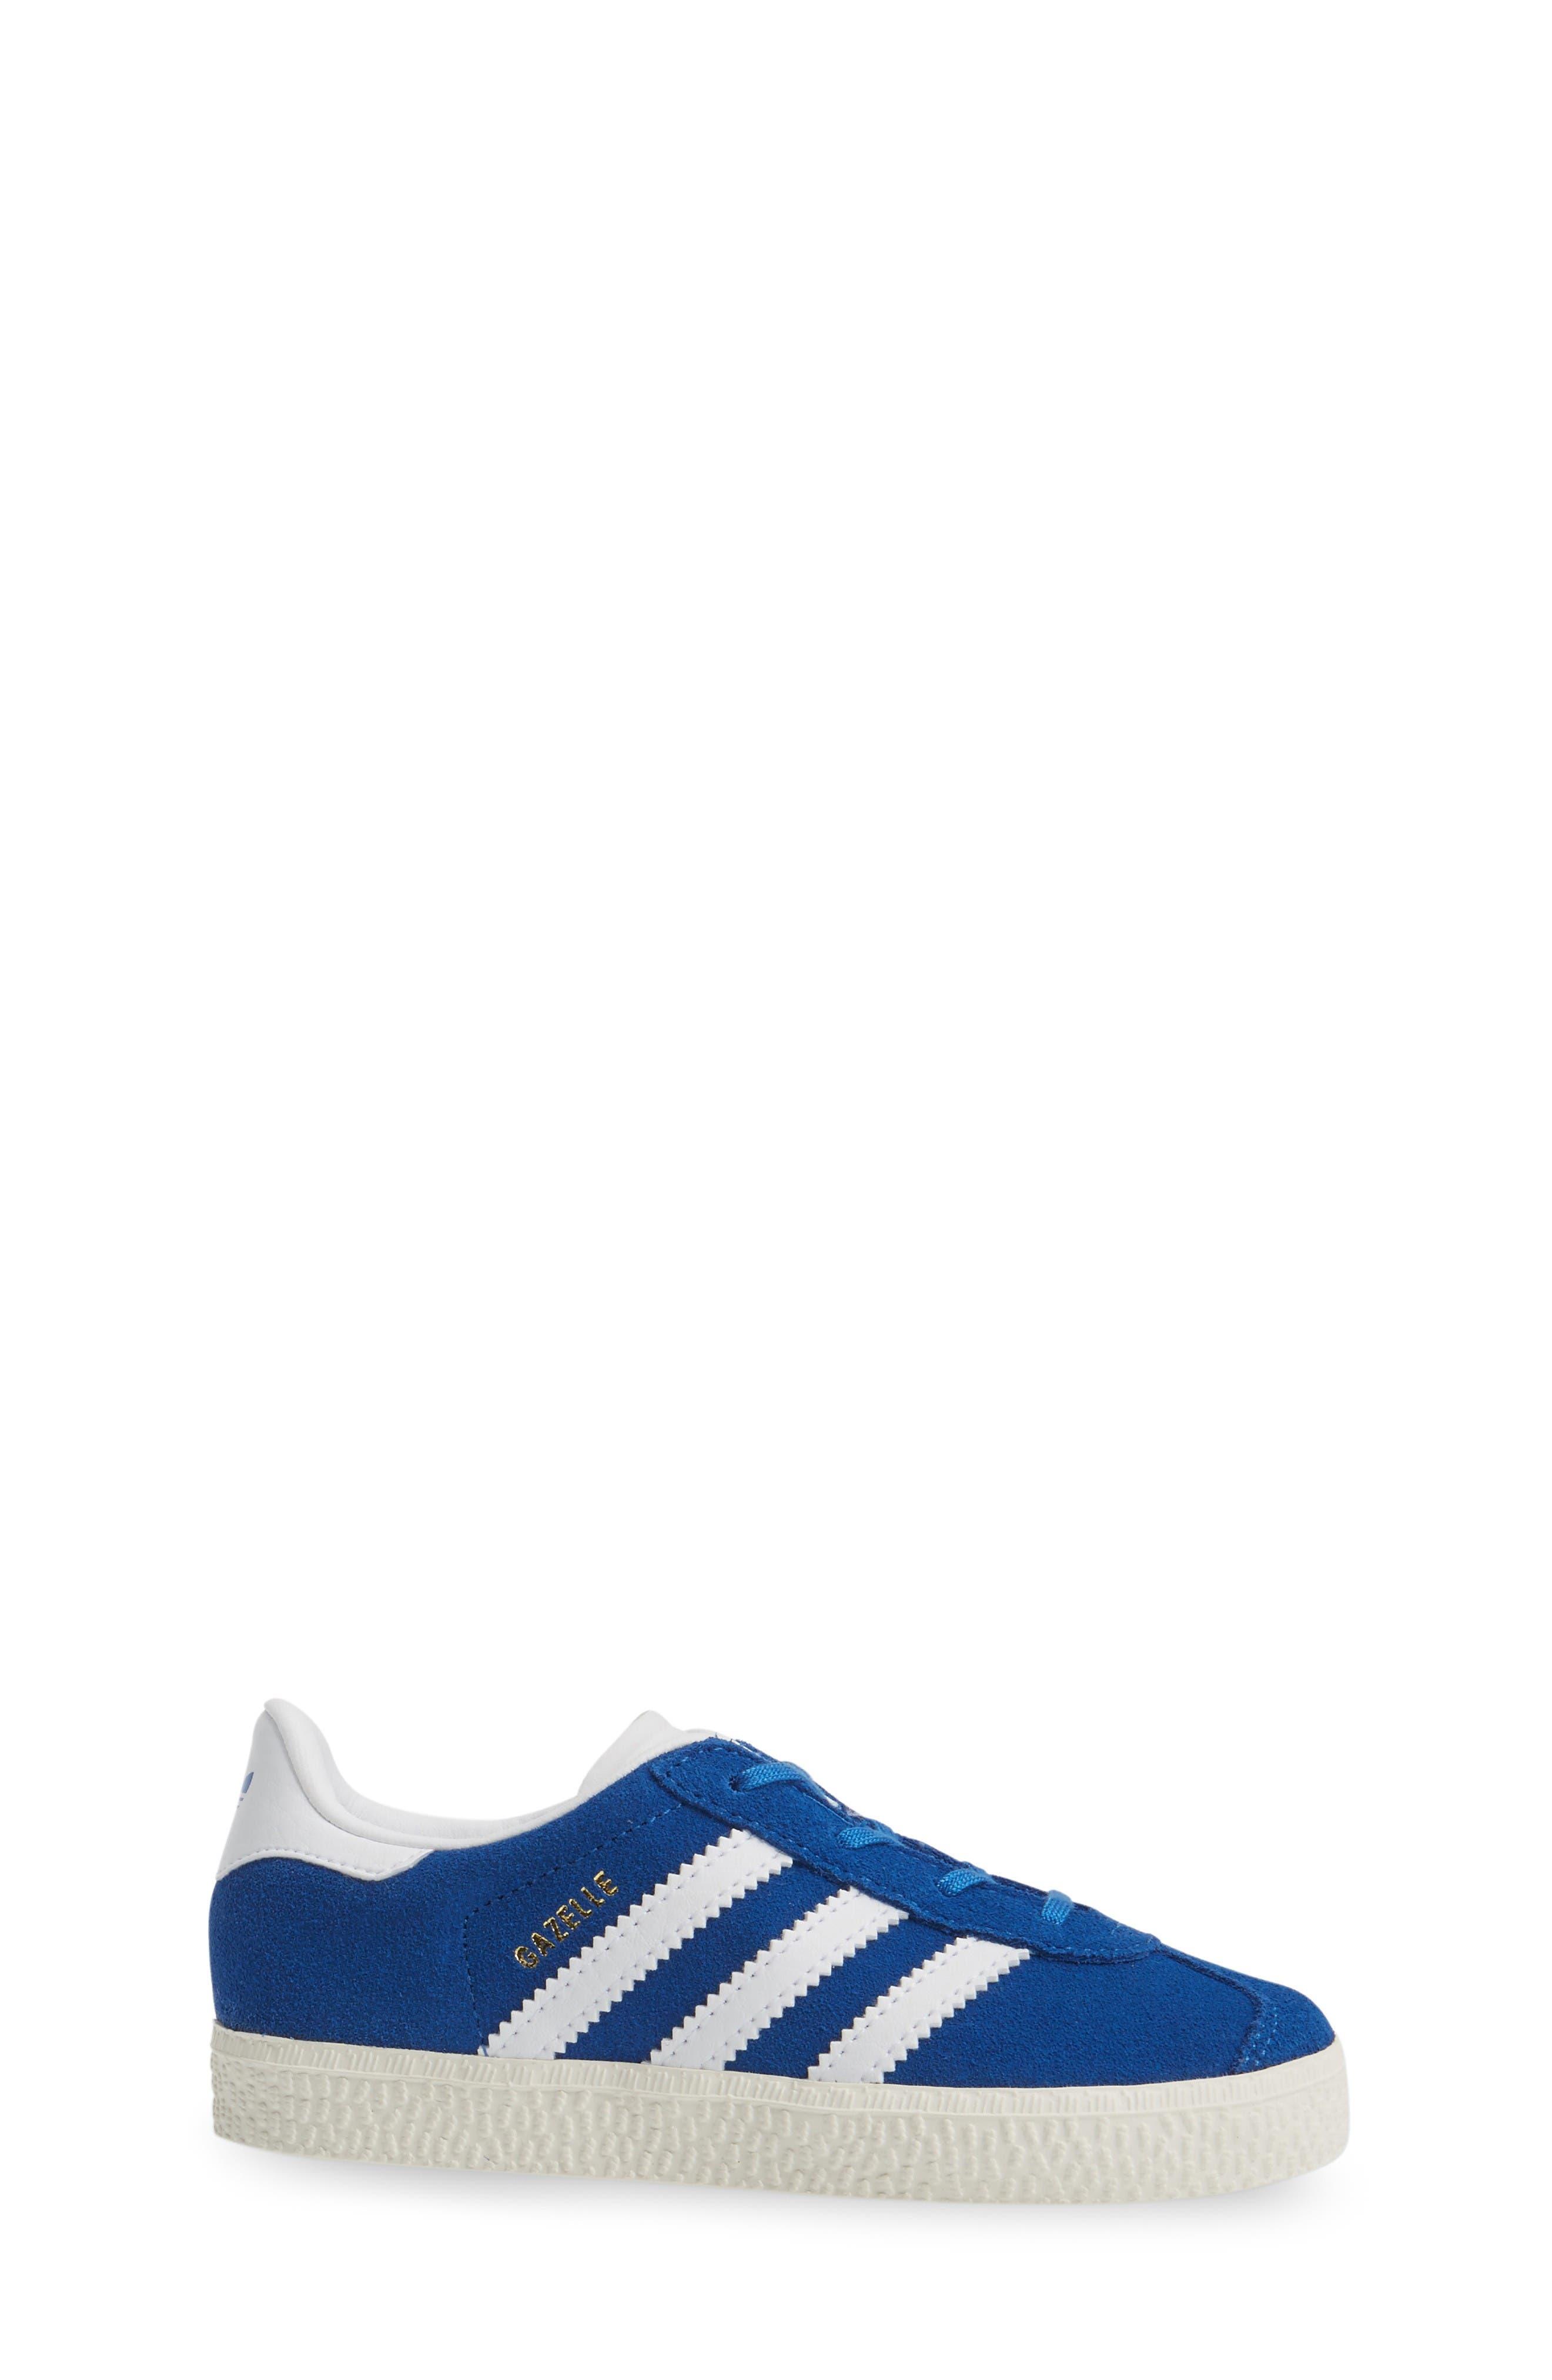 Gazelle Sneaker,                             Alternate thumbnail 3, color,                             Blue/ White/ Gold Metallic